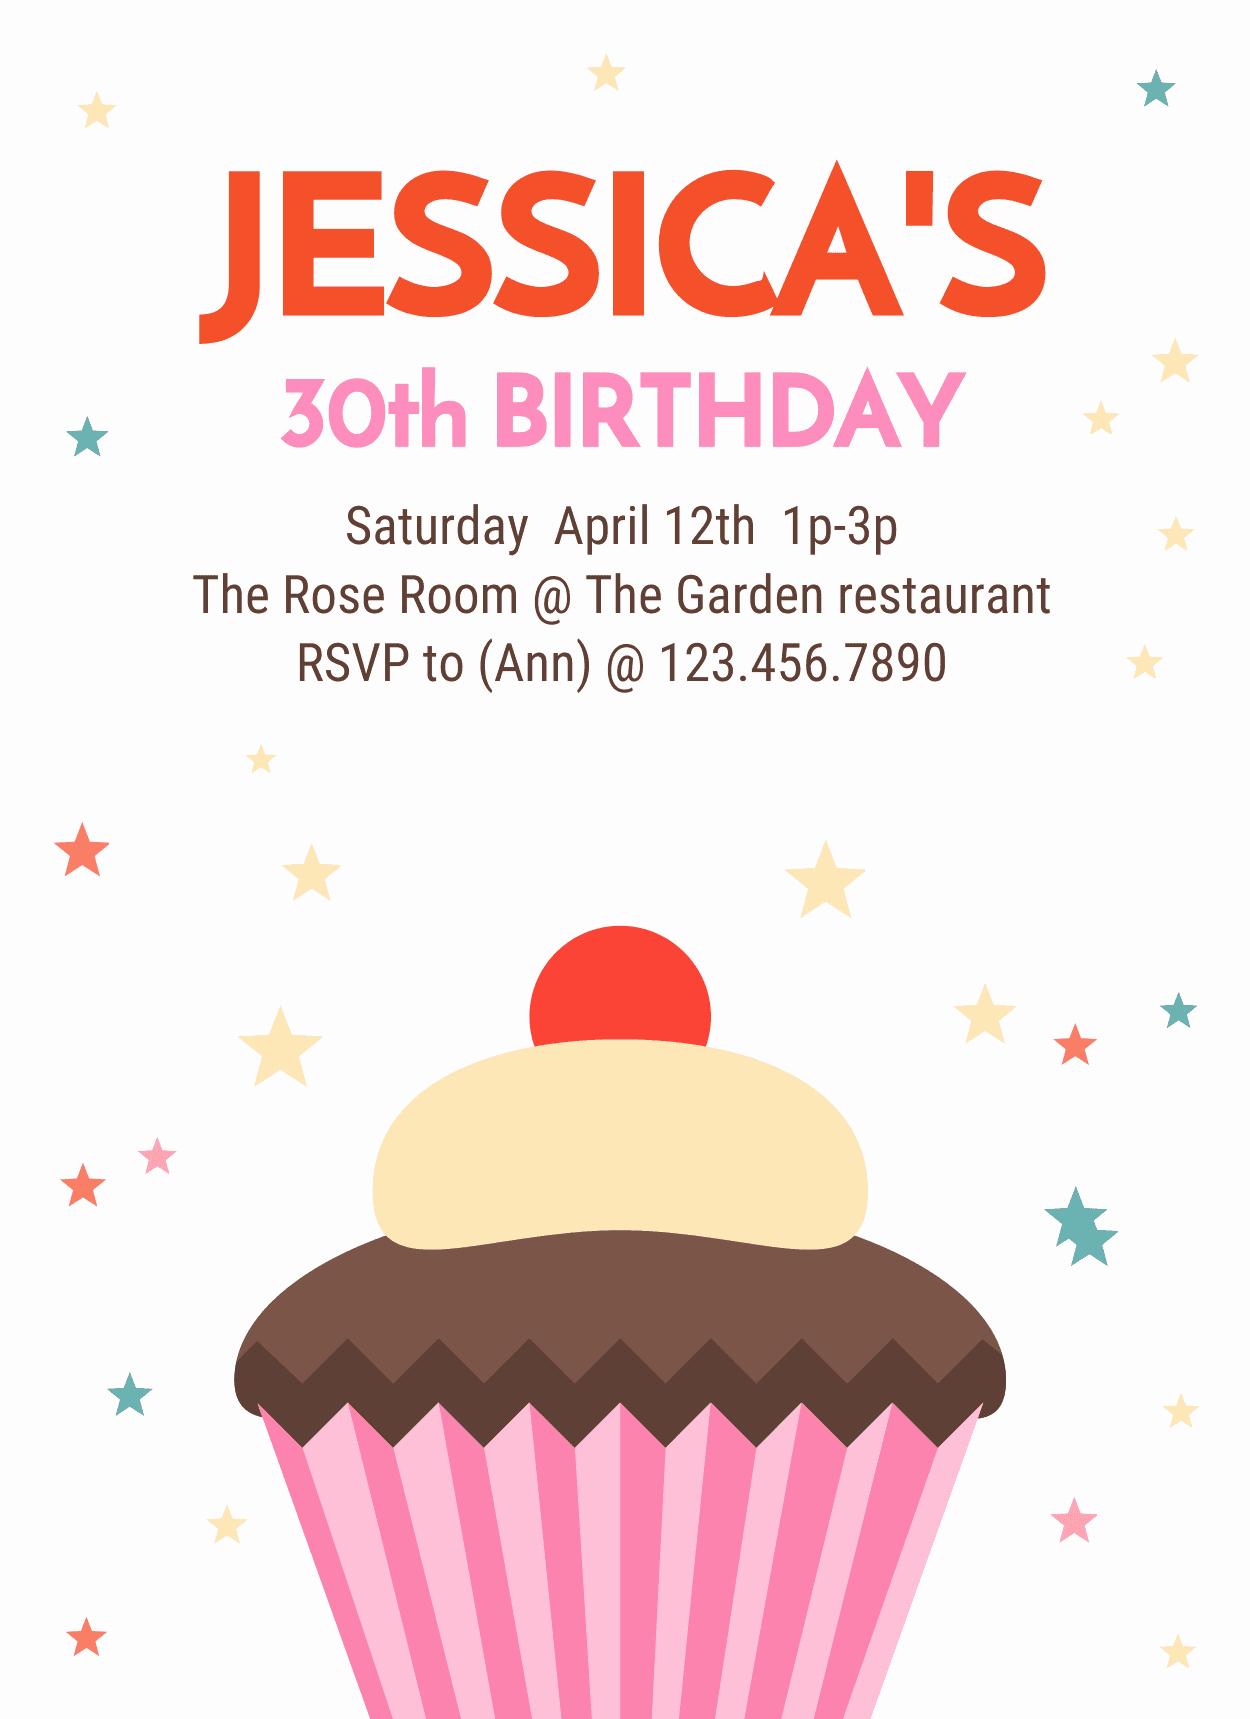 Birthday Party Invitation Templates Beautiful 10 Creative Birthday Invitation Card Design Tips